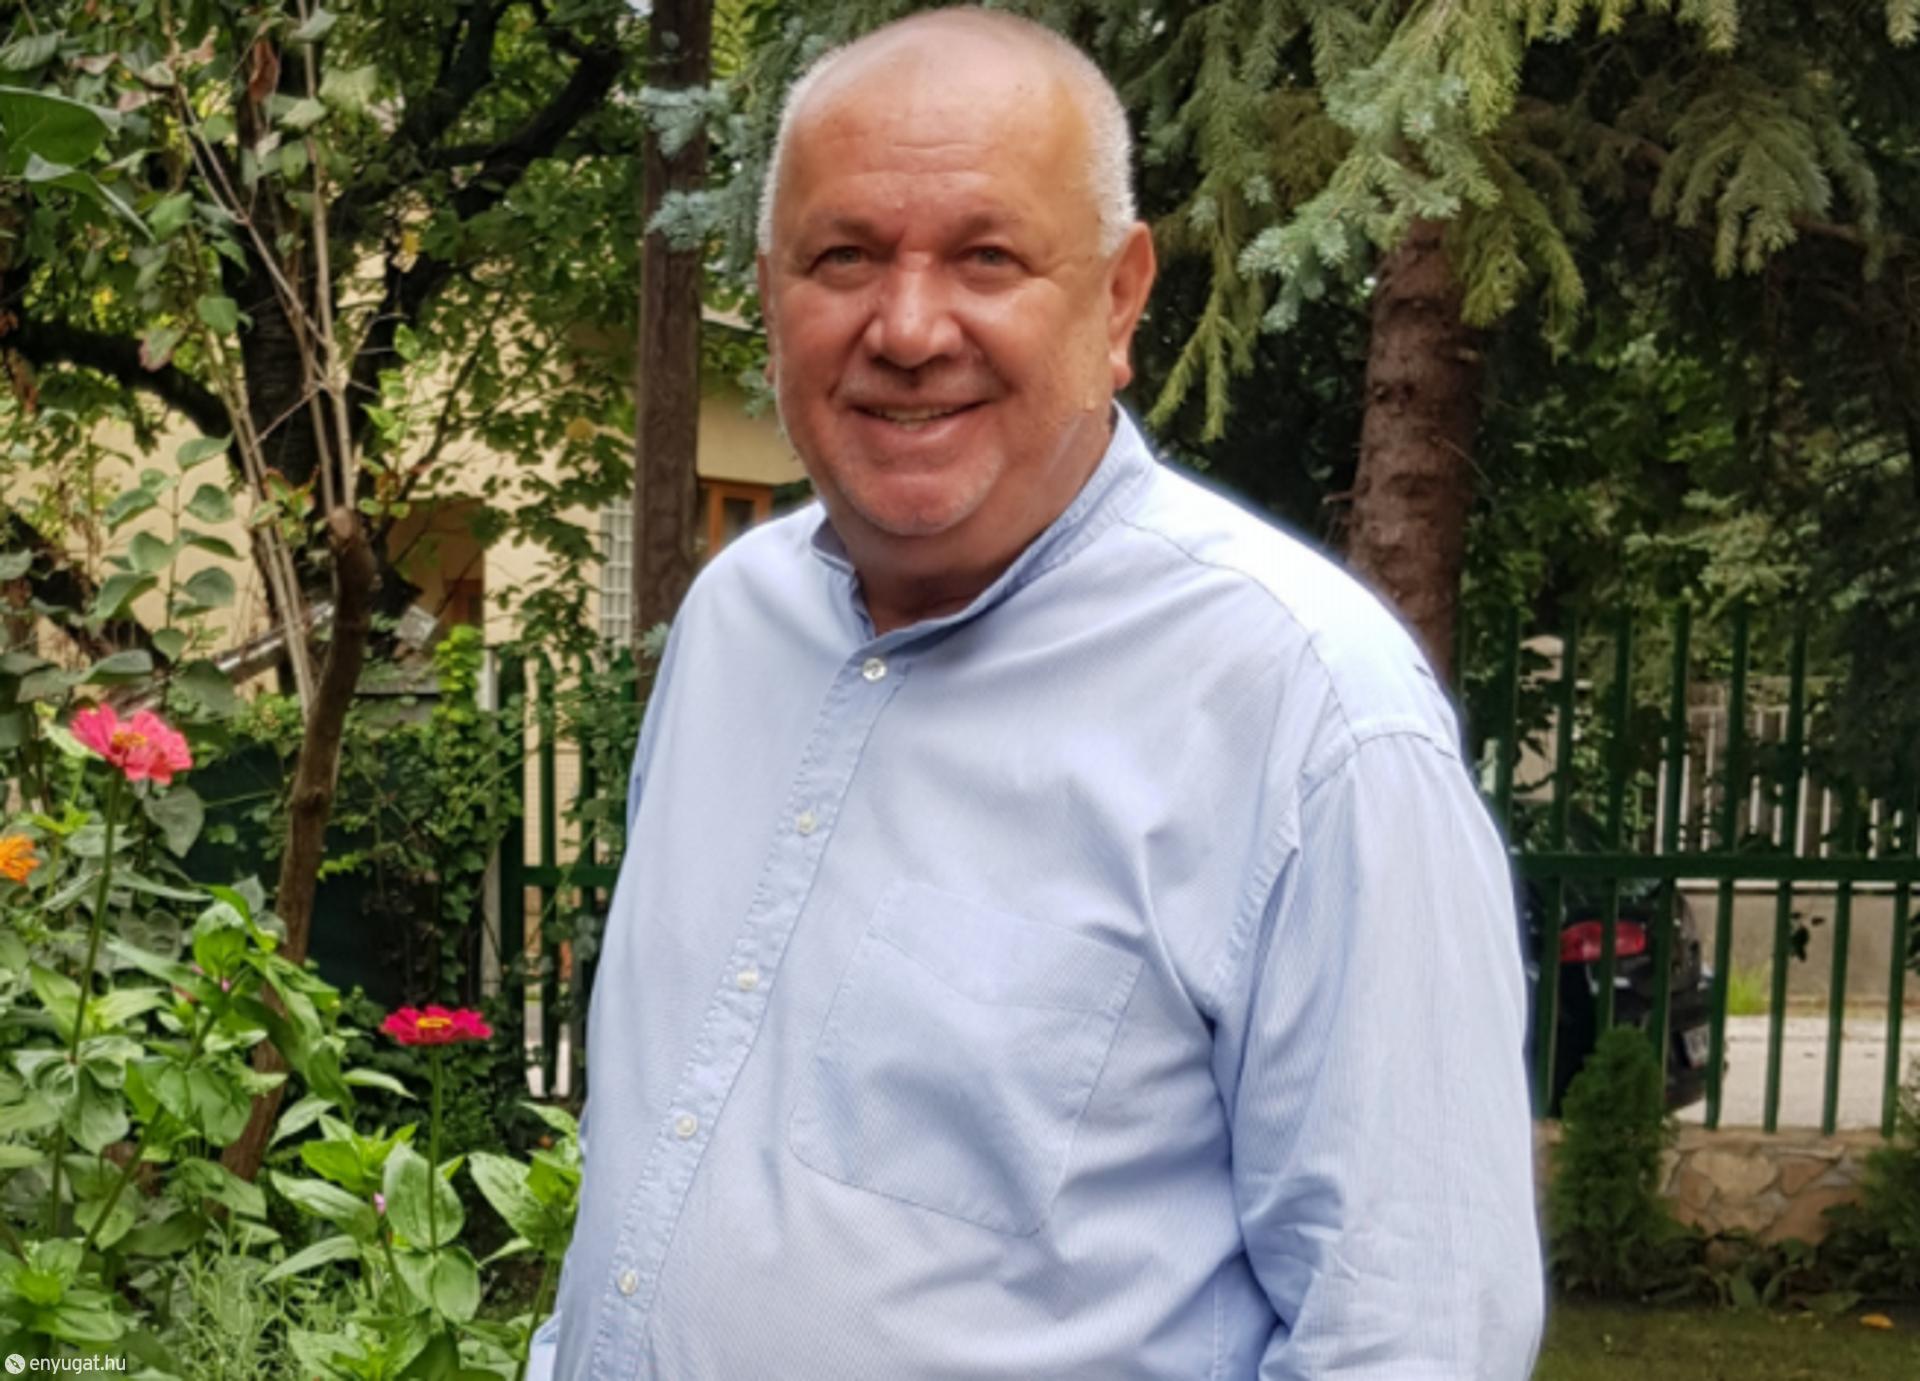 Horváth Ernő Zoltán